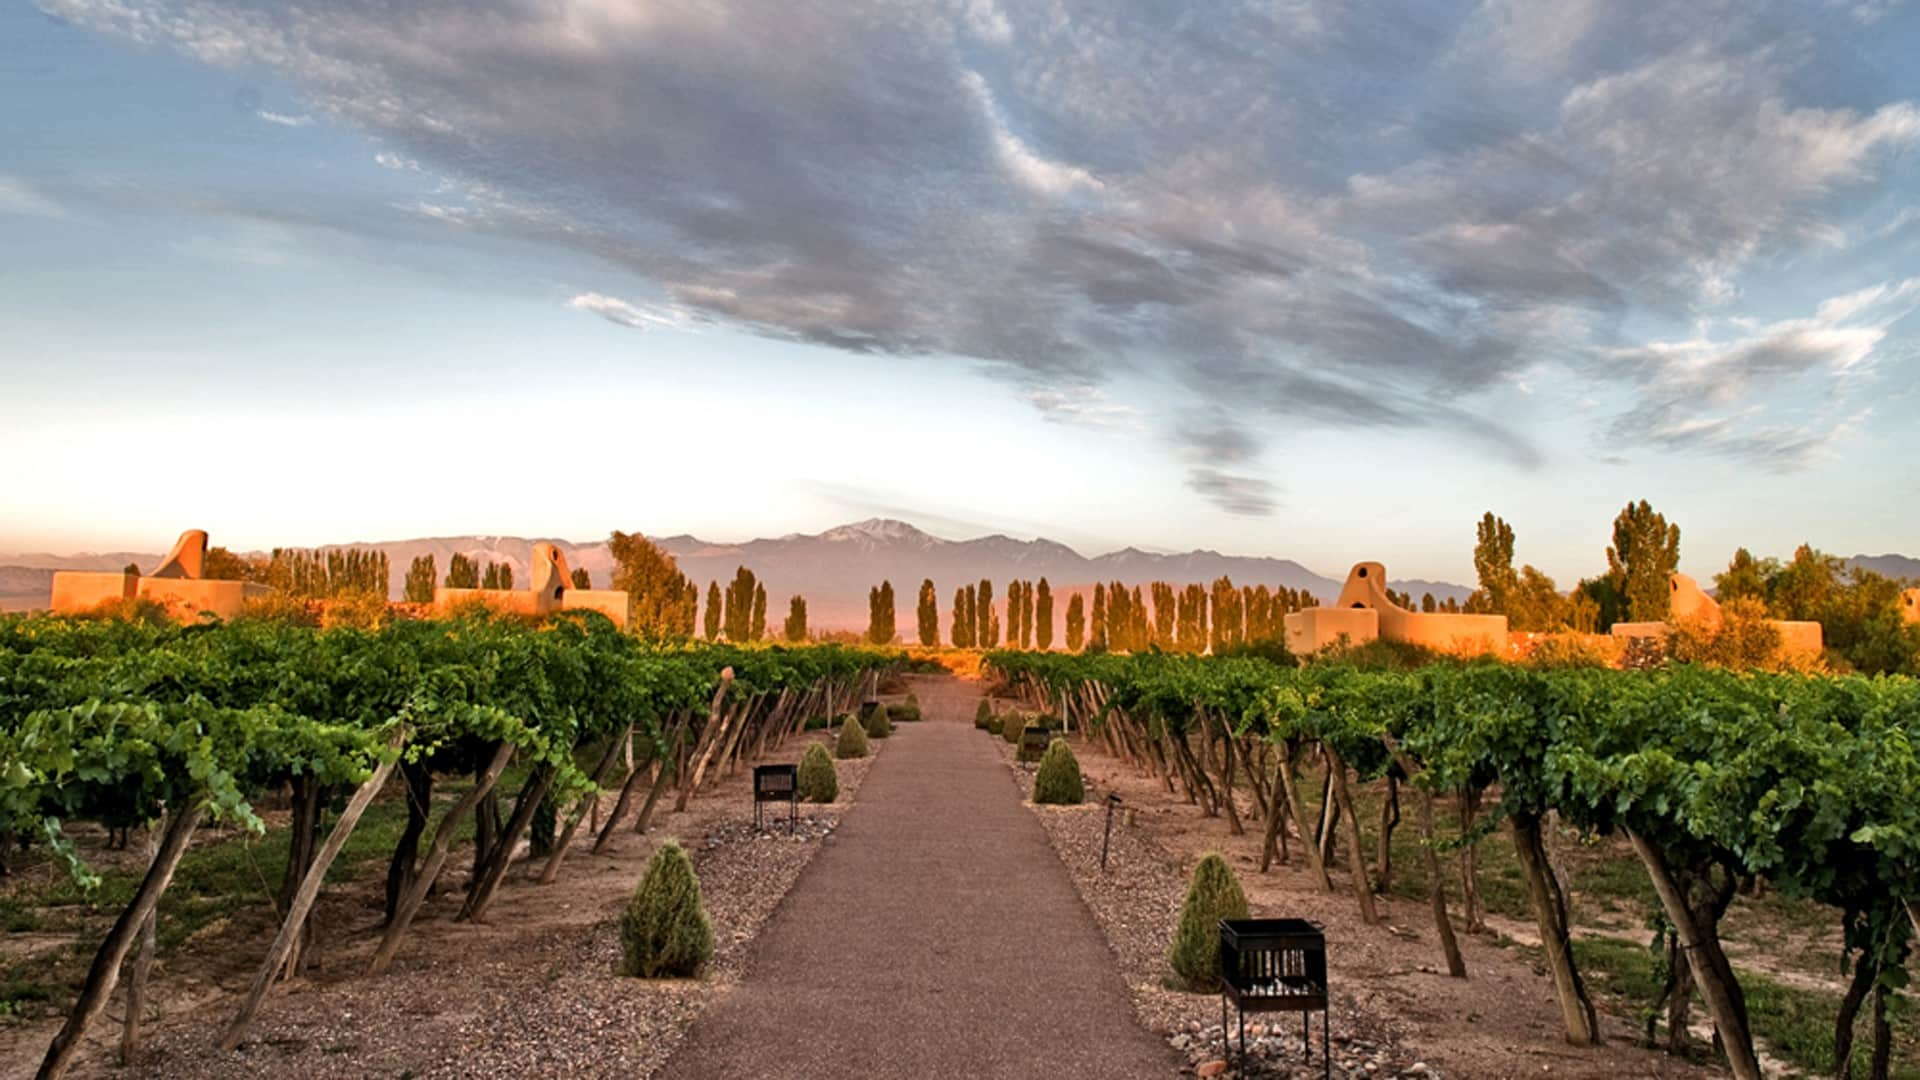 Les vignobles de Mendoza en Argentine